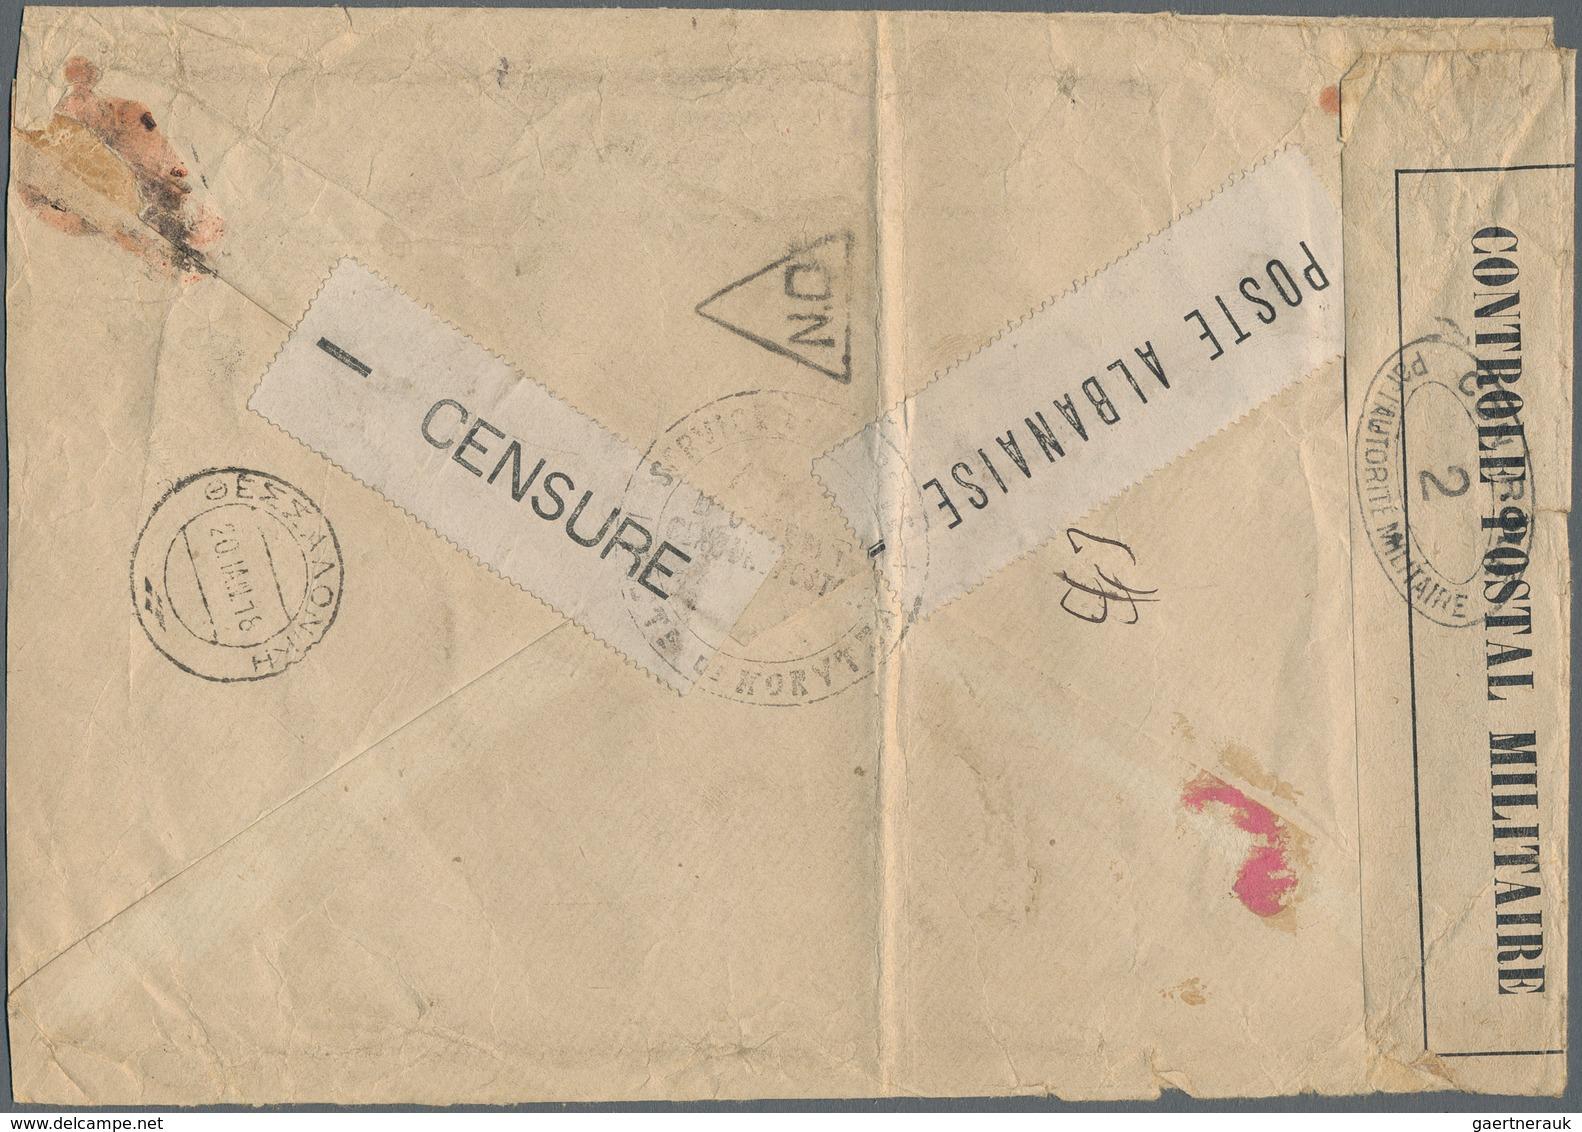 Albanien - Lokalausgaben: 1917, KORCA: 10 Cts Red-brown/black, 50 Cts Lilac/black And Horizontal Str - Albanien